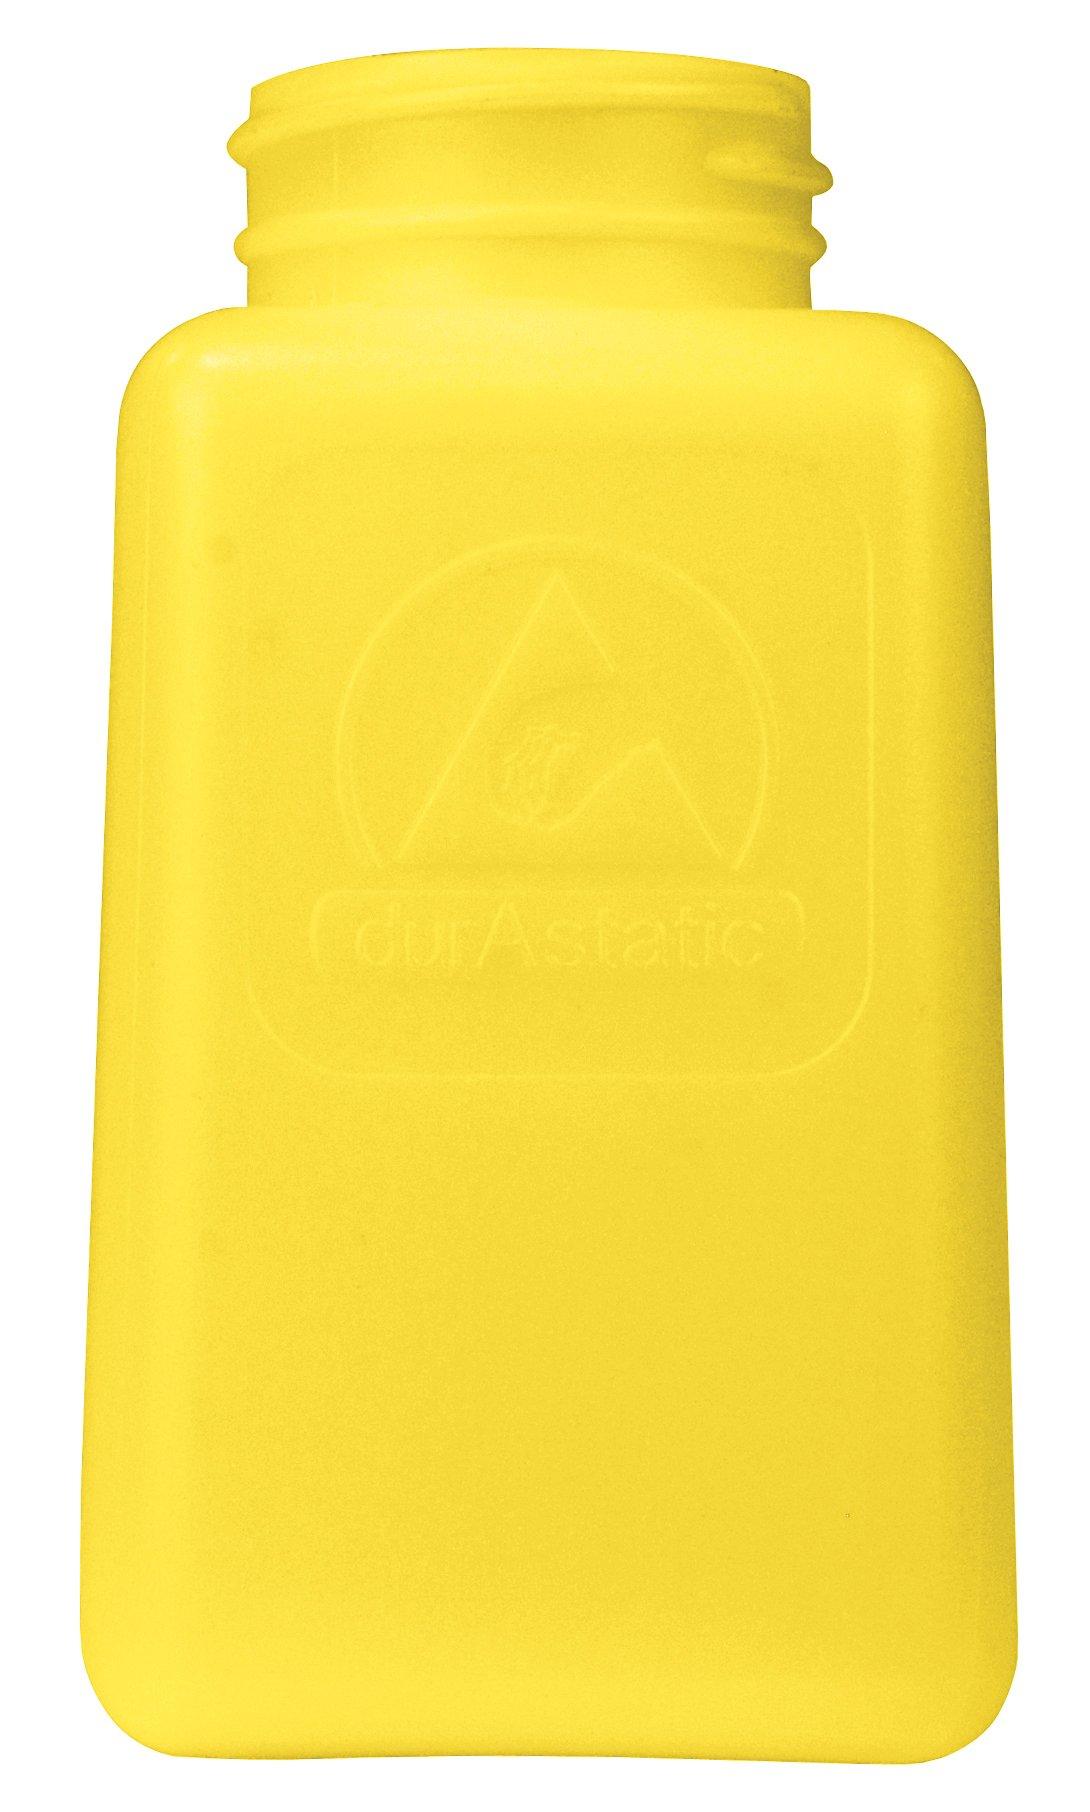 Bottle, 6 oz, Yellow